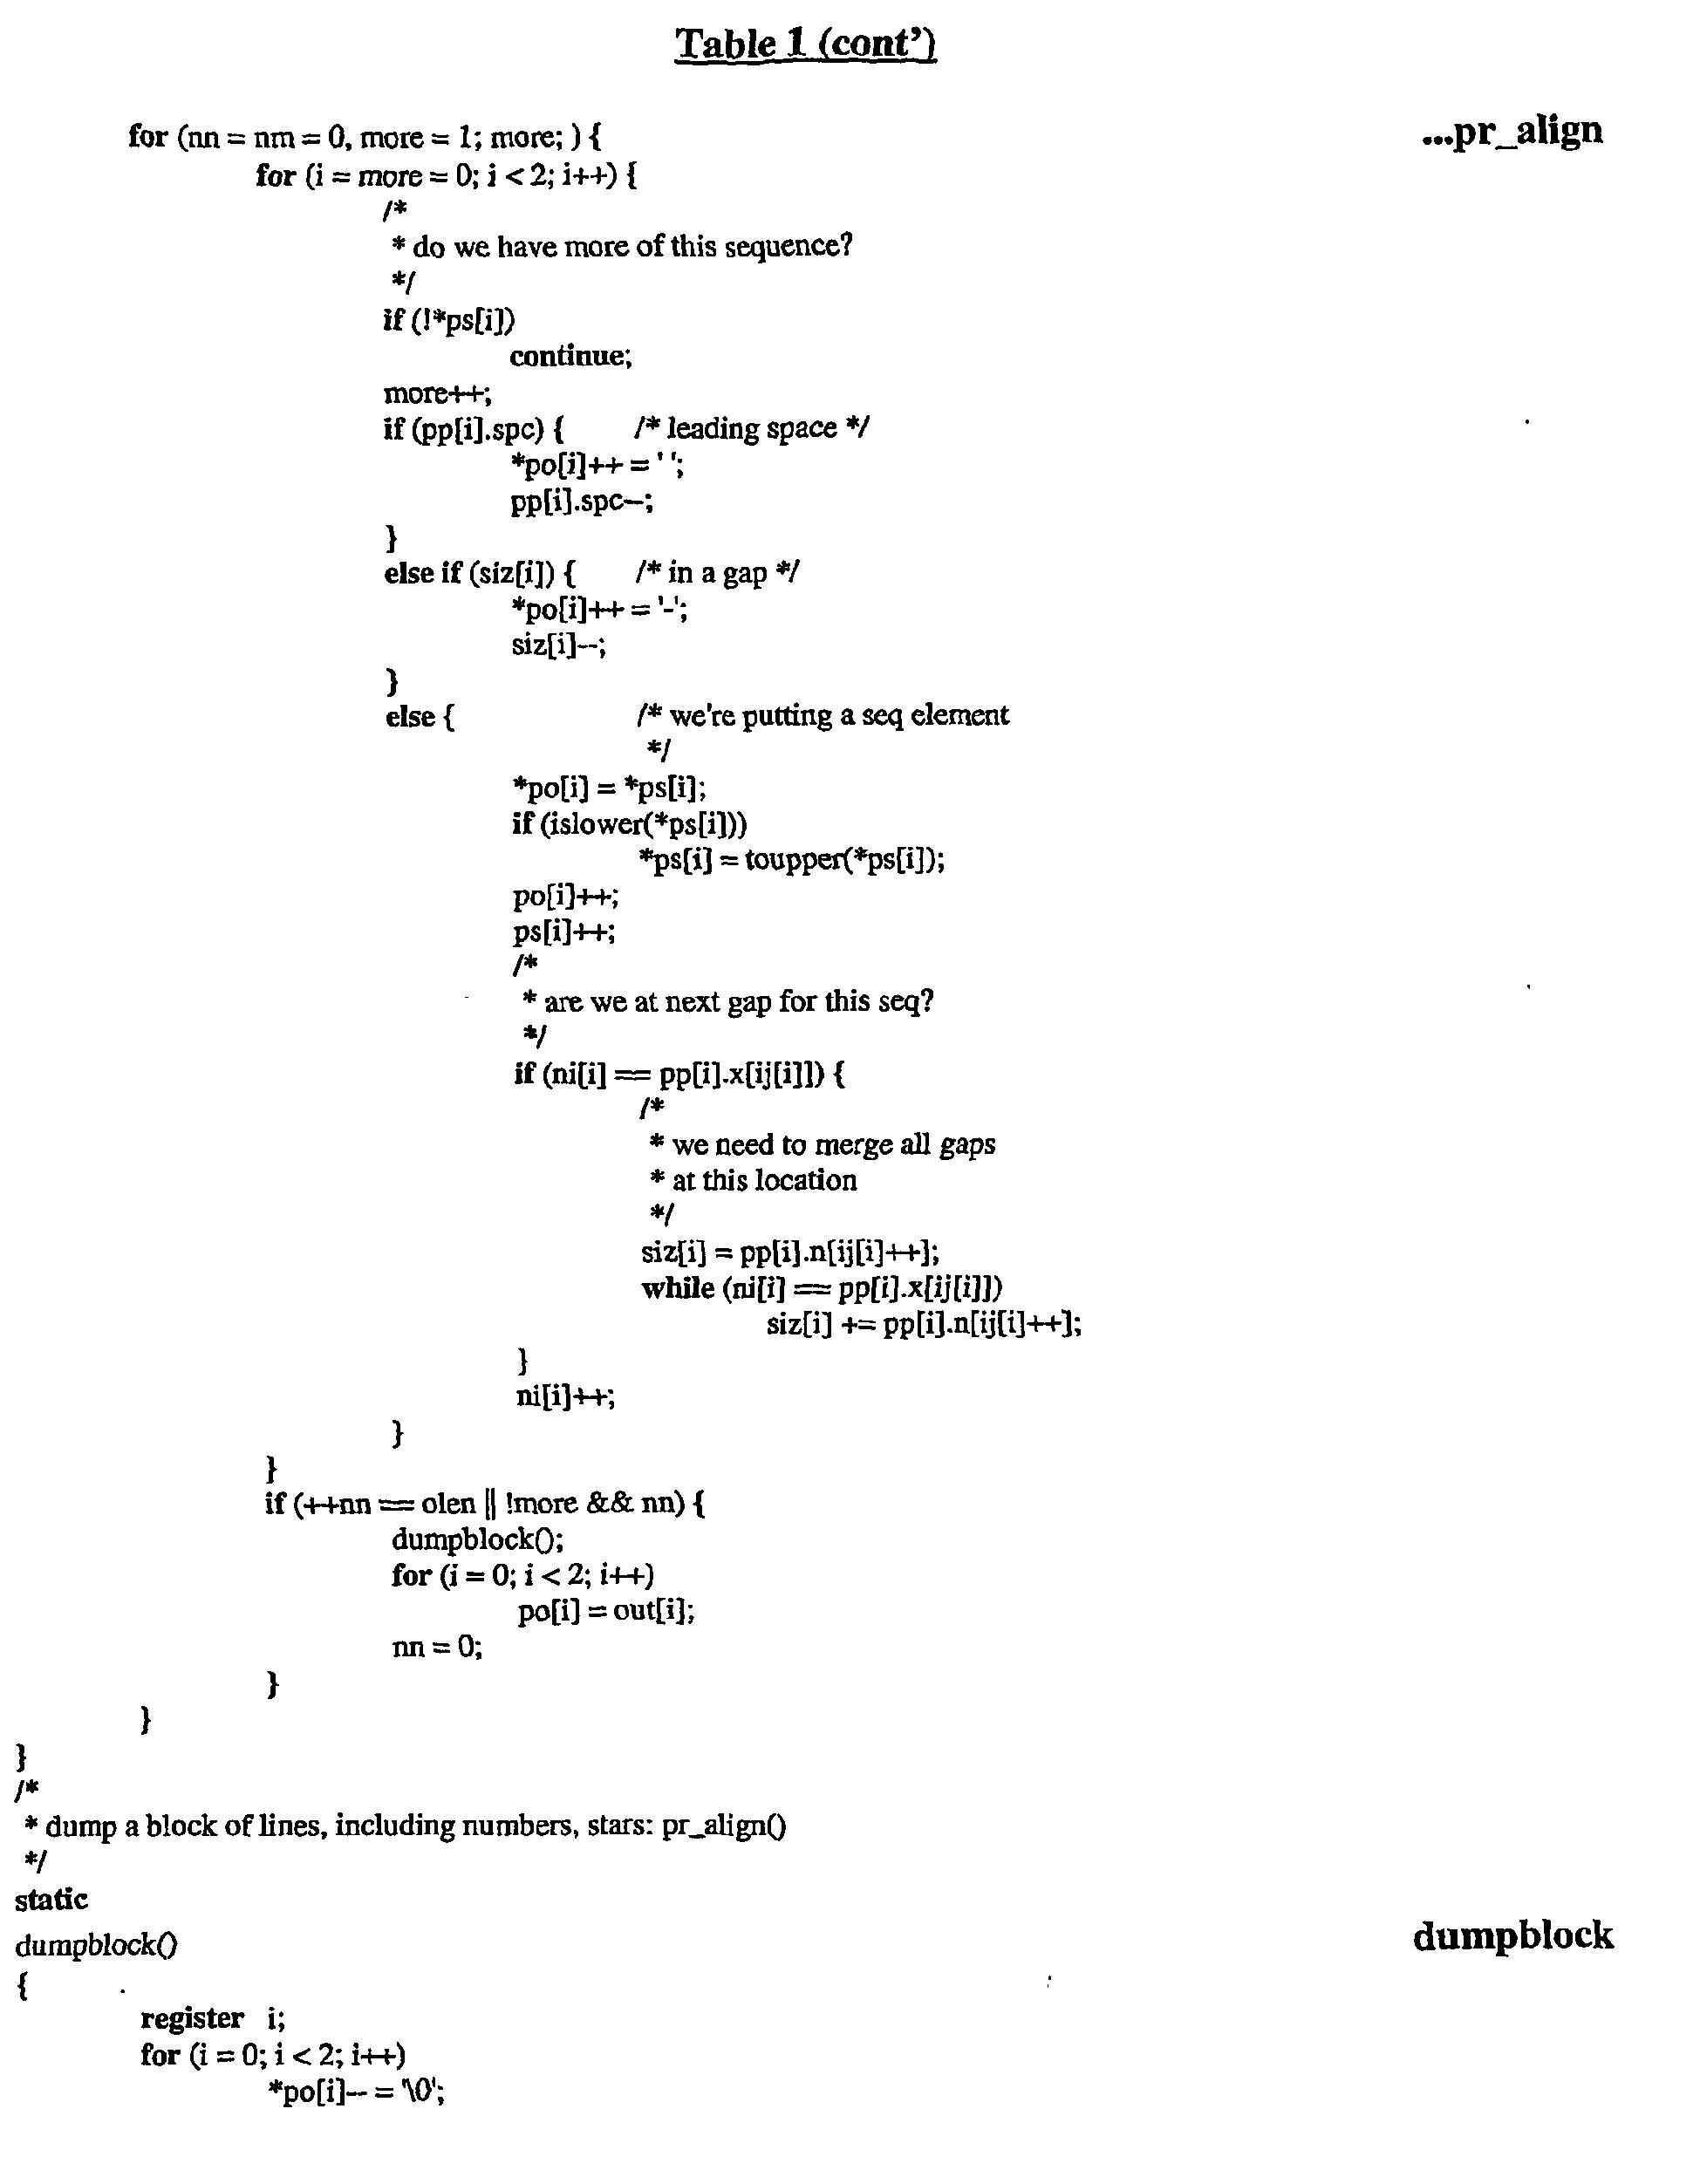 Ep2135881a1 Antibodies Binding To The Tumour Associated Antigen